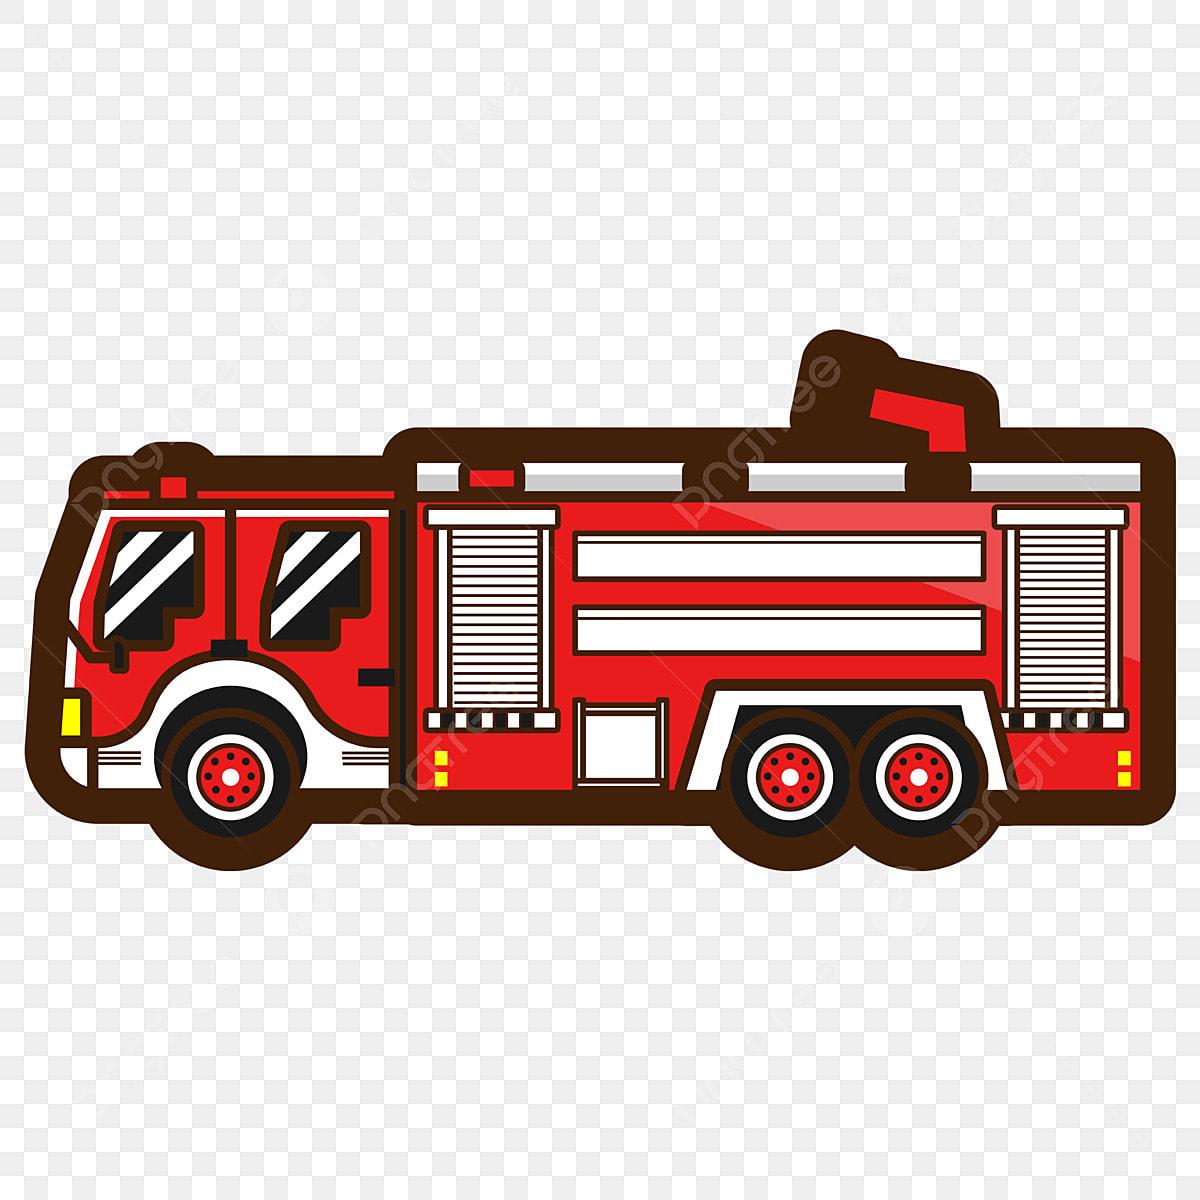 Gambar Elemen Bahan Truk Pemadam Kebakaran Kartun Ai Kartun Truk Pemadam Png Dan Vektor Dengan Latar Belakang Transparan Untuk Unduh Gratis